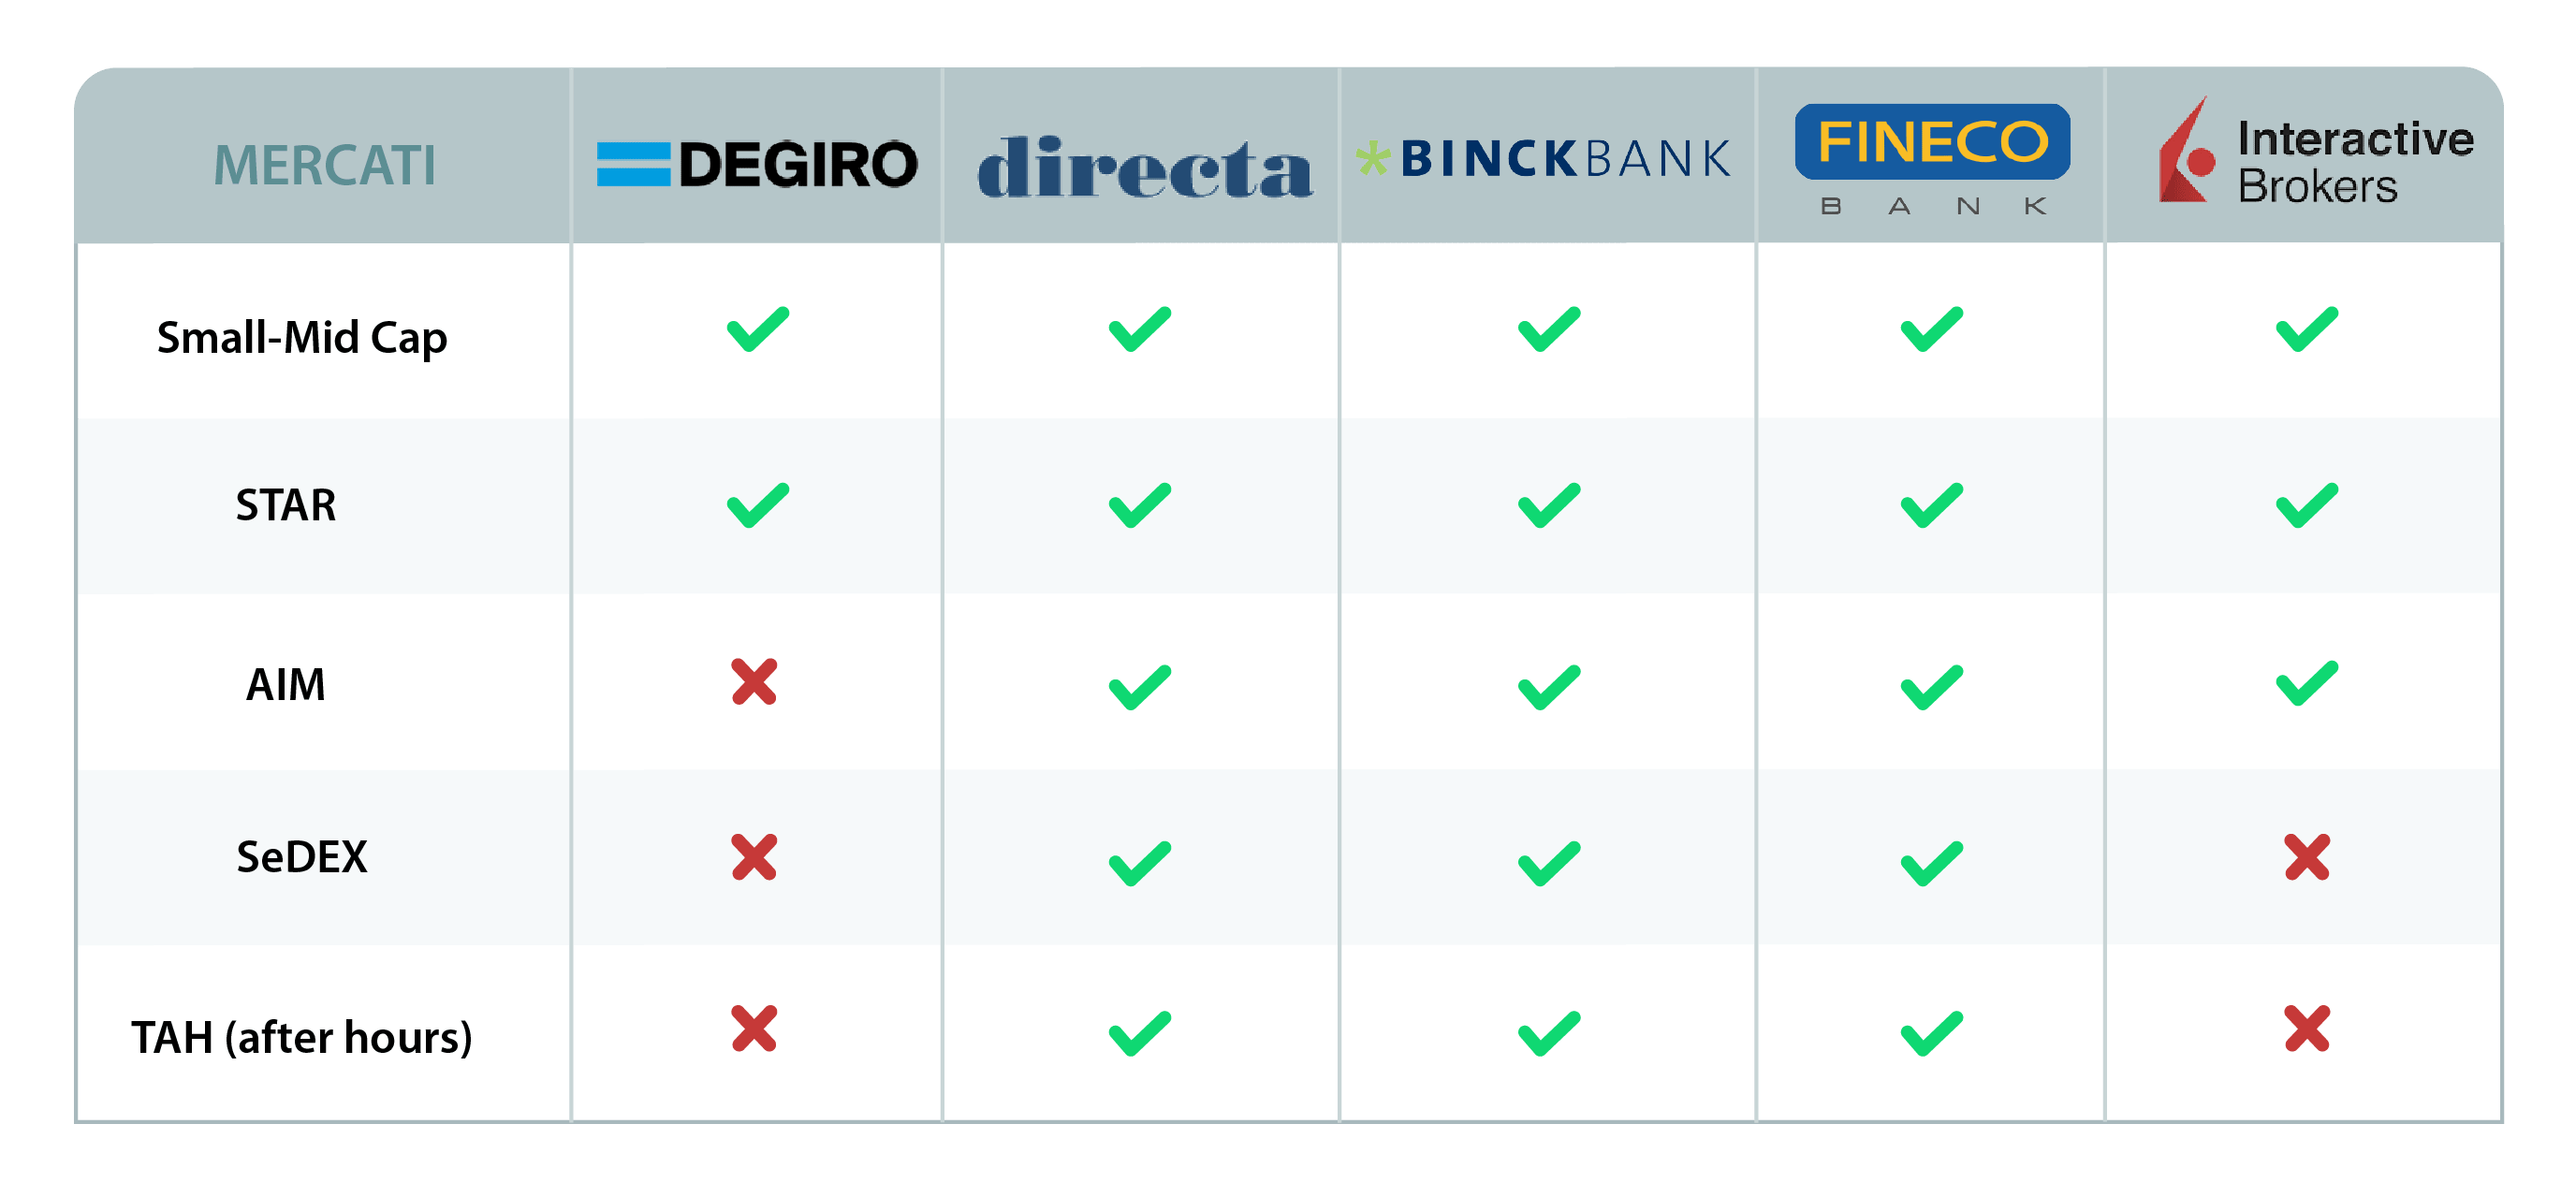 402ddcc0cf Come comprare azioni italiane? - QualeBroker.com